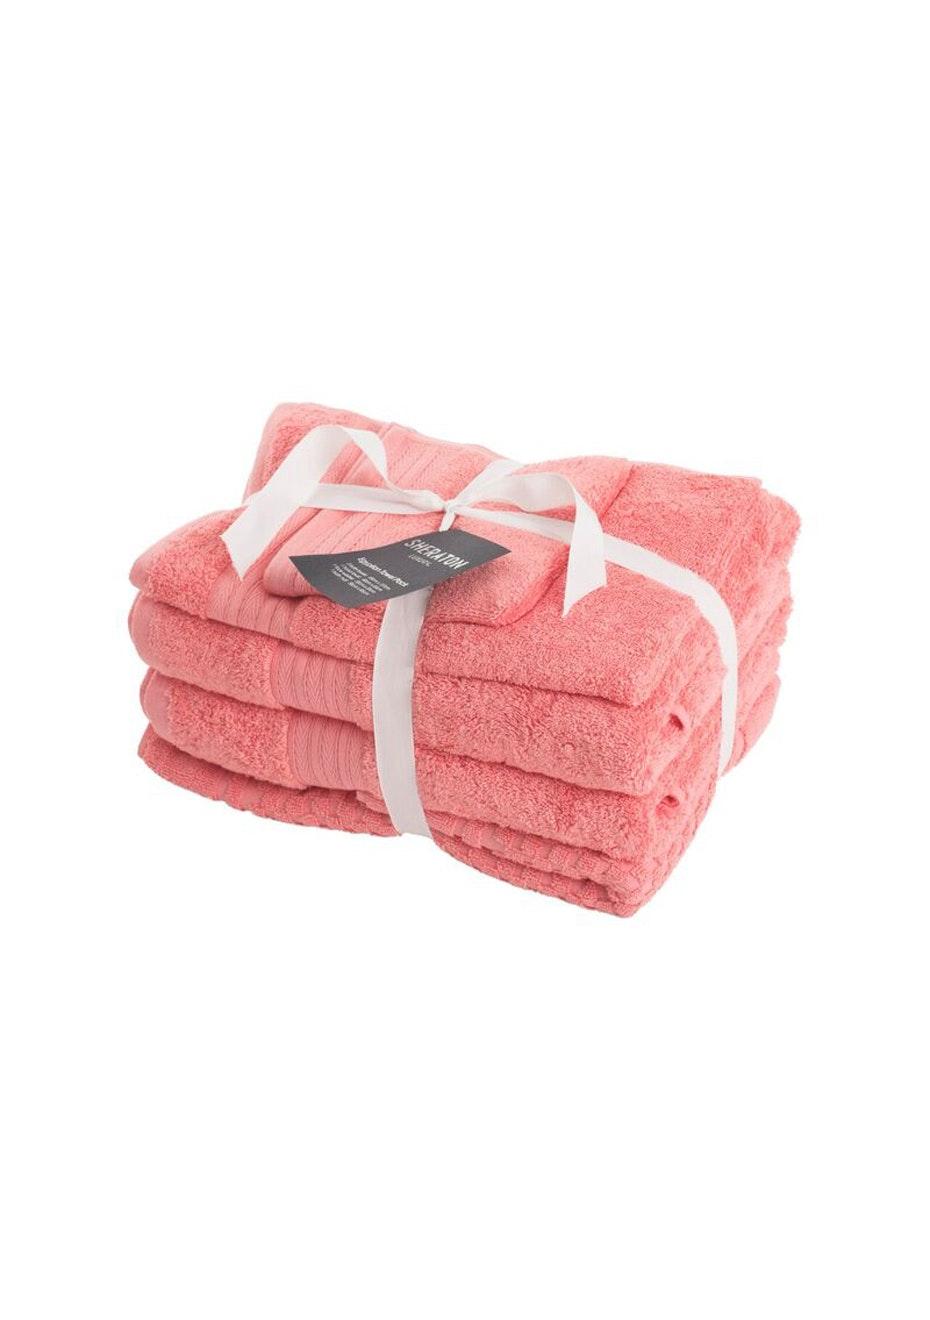 Sheraton Egptian 5 Piece Towel Pack - Colour Coral